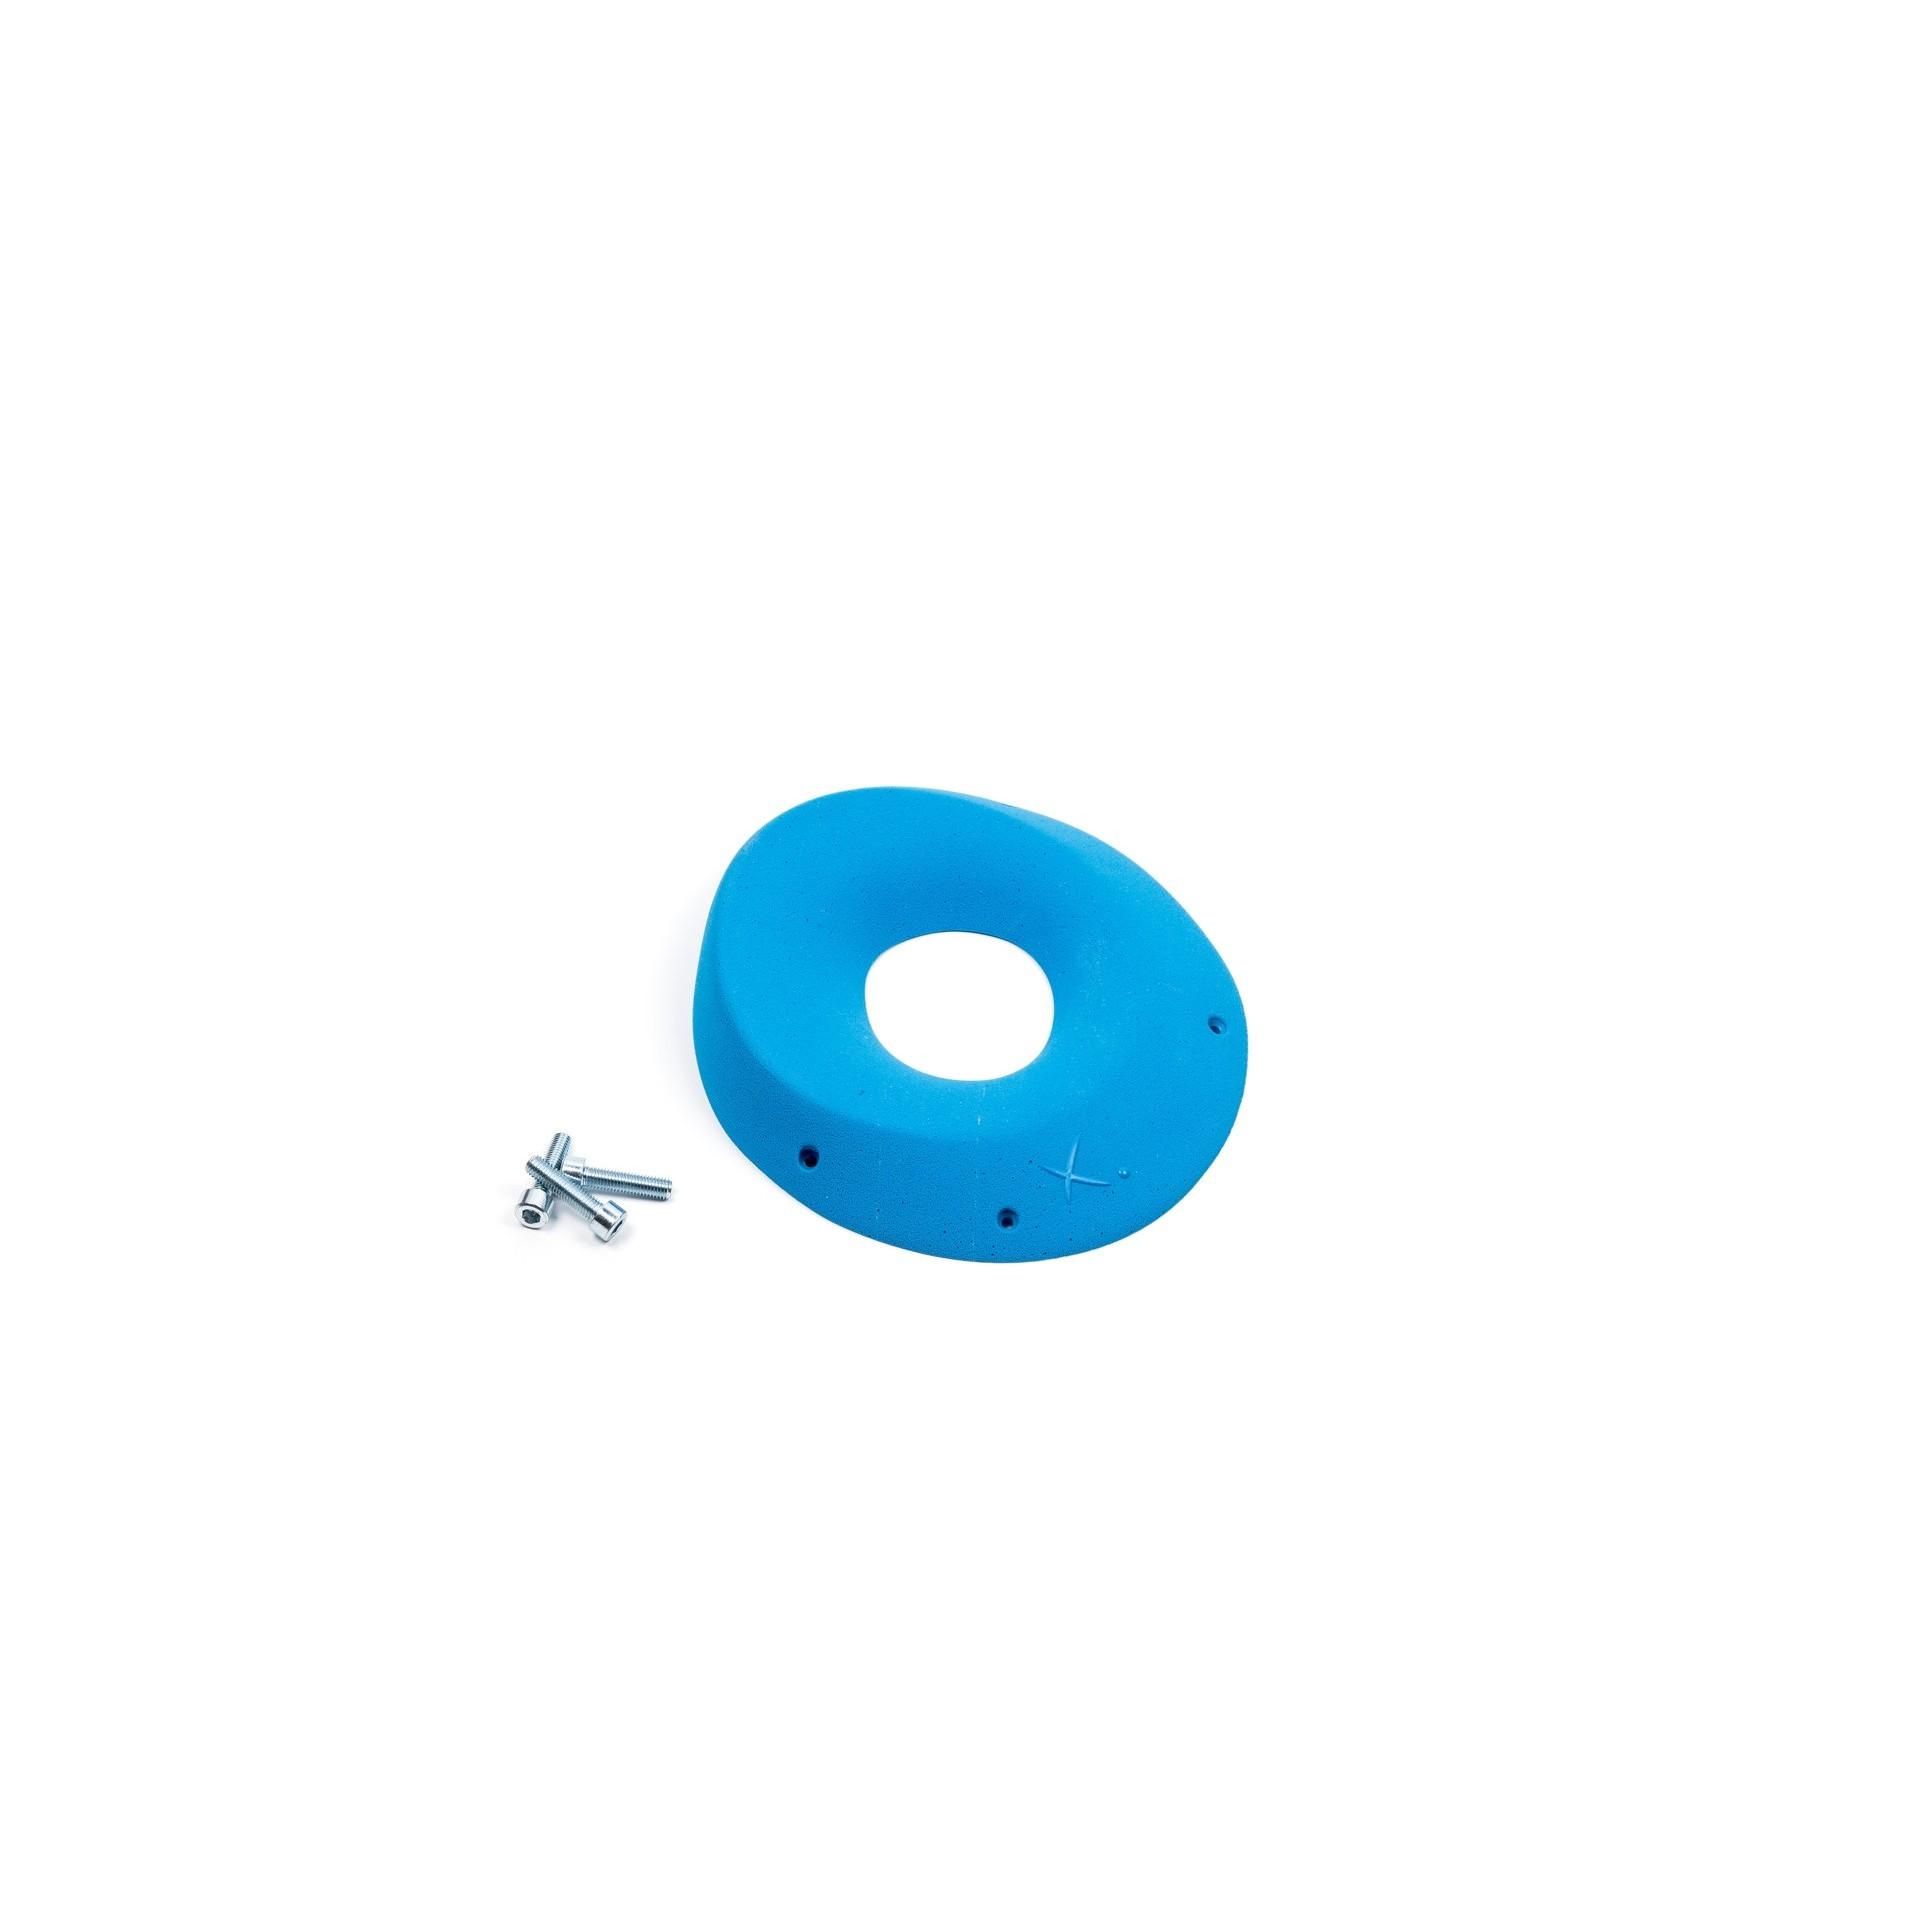 Romain Desgranges - Black Hole 2 (PU) - Holds.fr